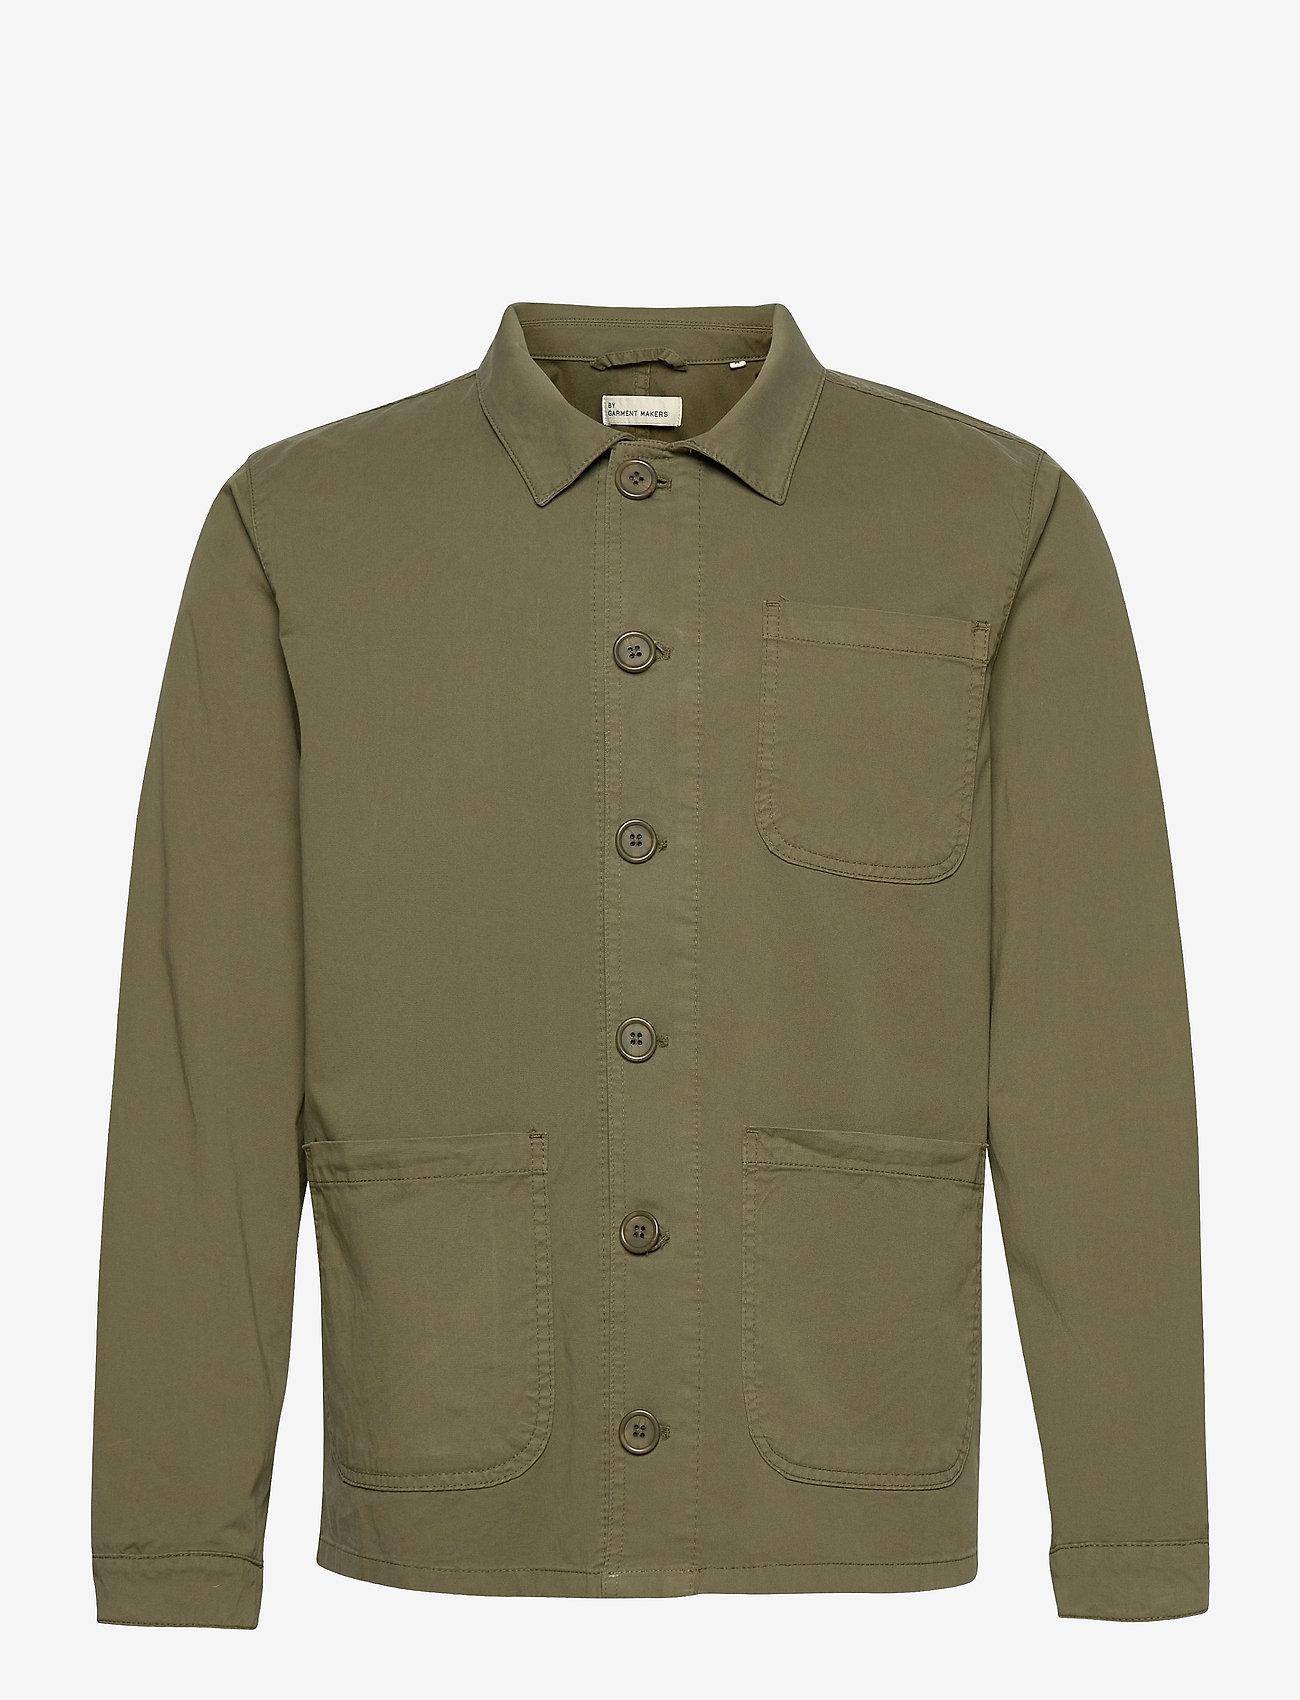 By Garment Makers - The Organic Workwear Jacket - vêtements - oil green - 1